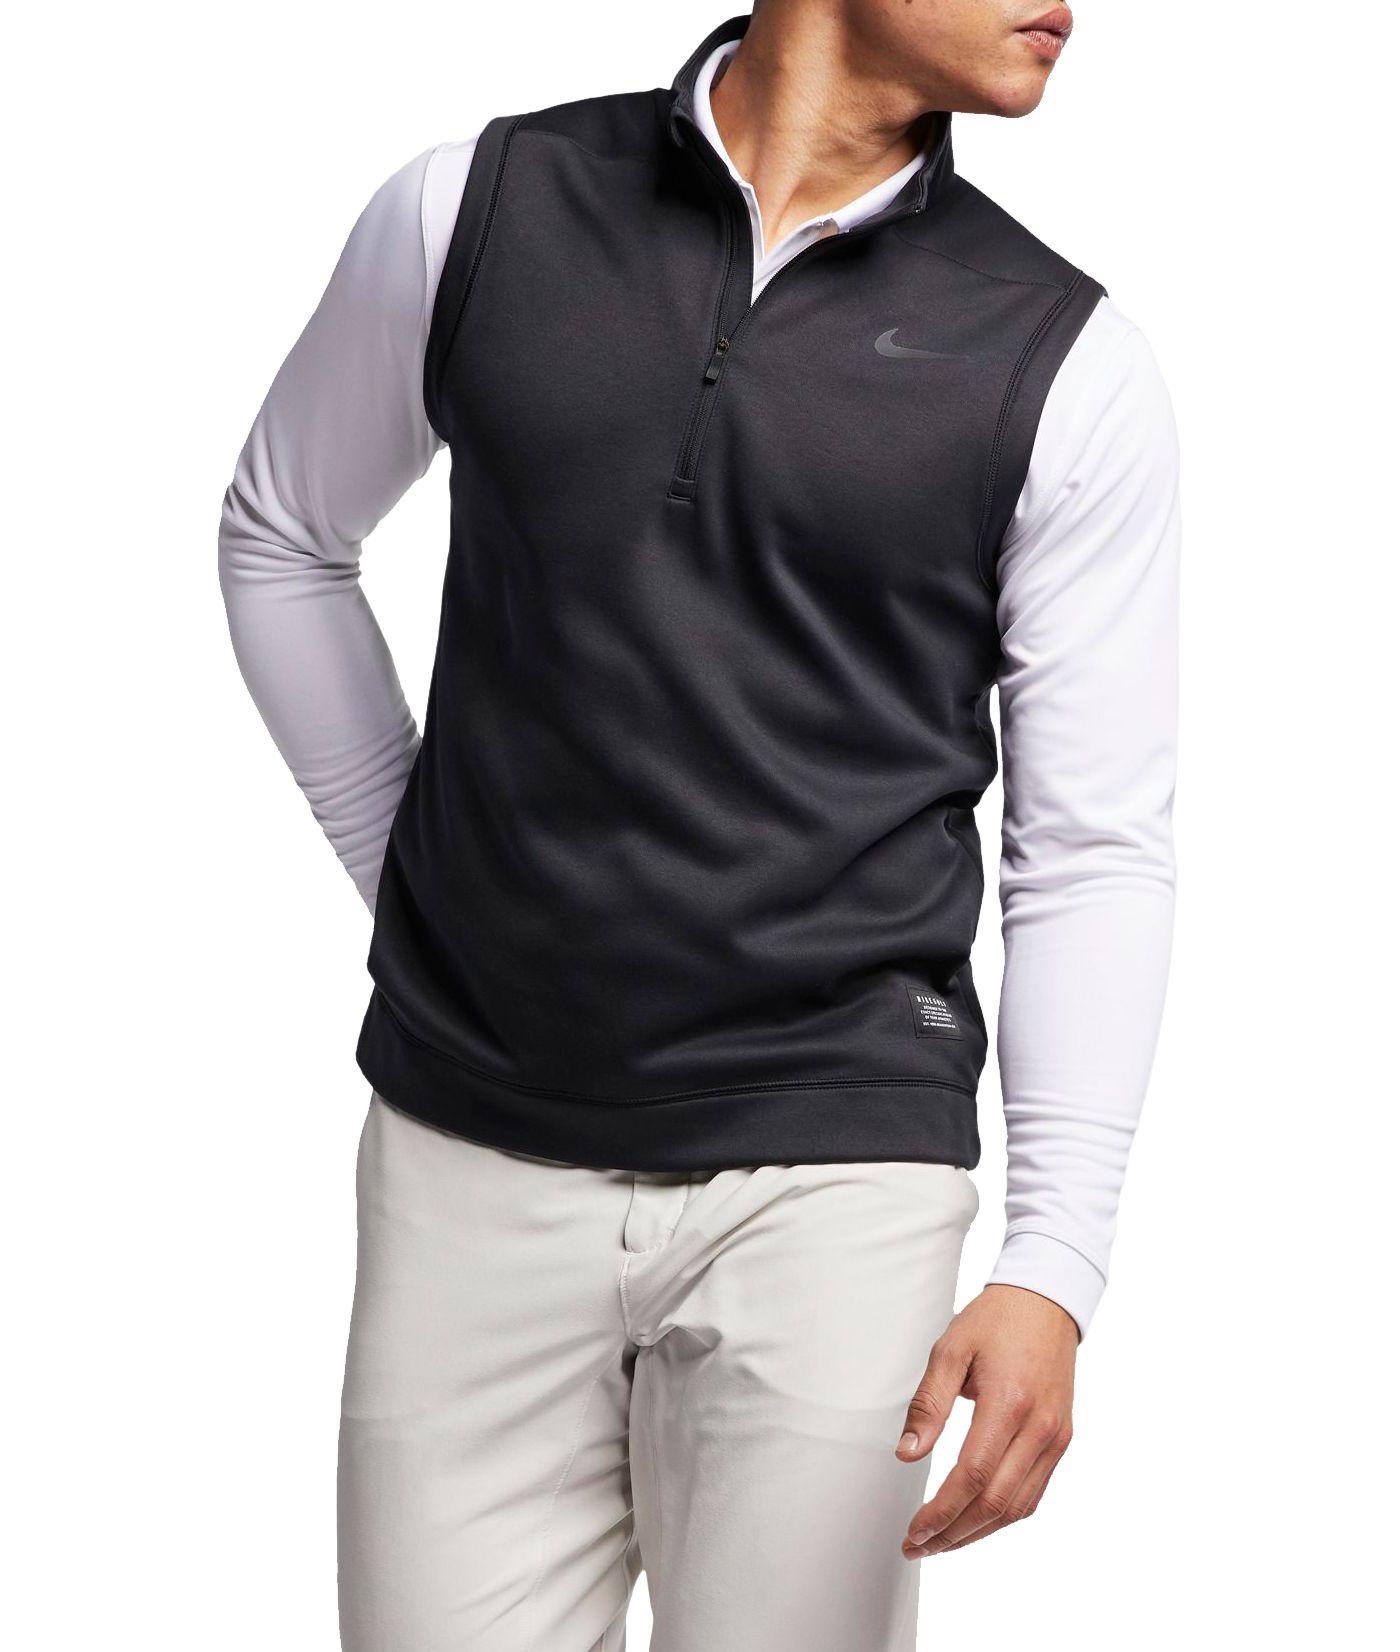 Nike Men's Therma Repel Golf Vest